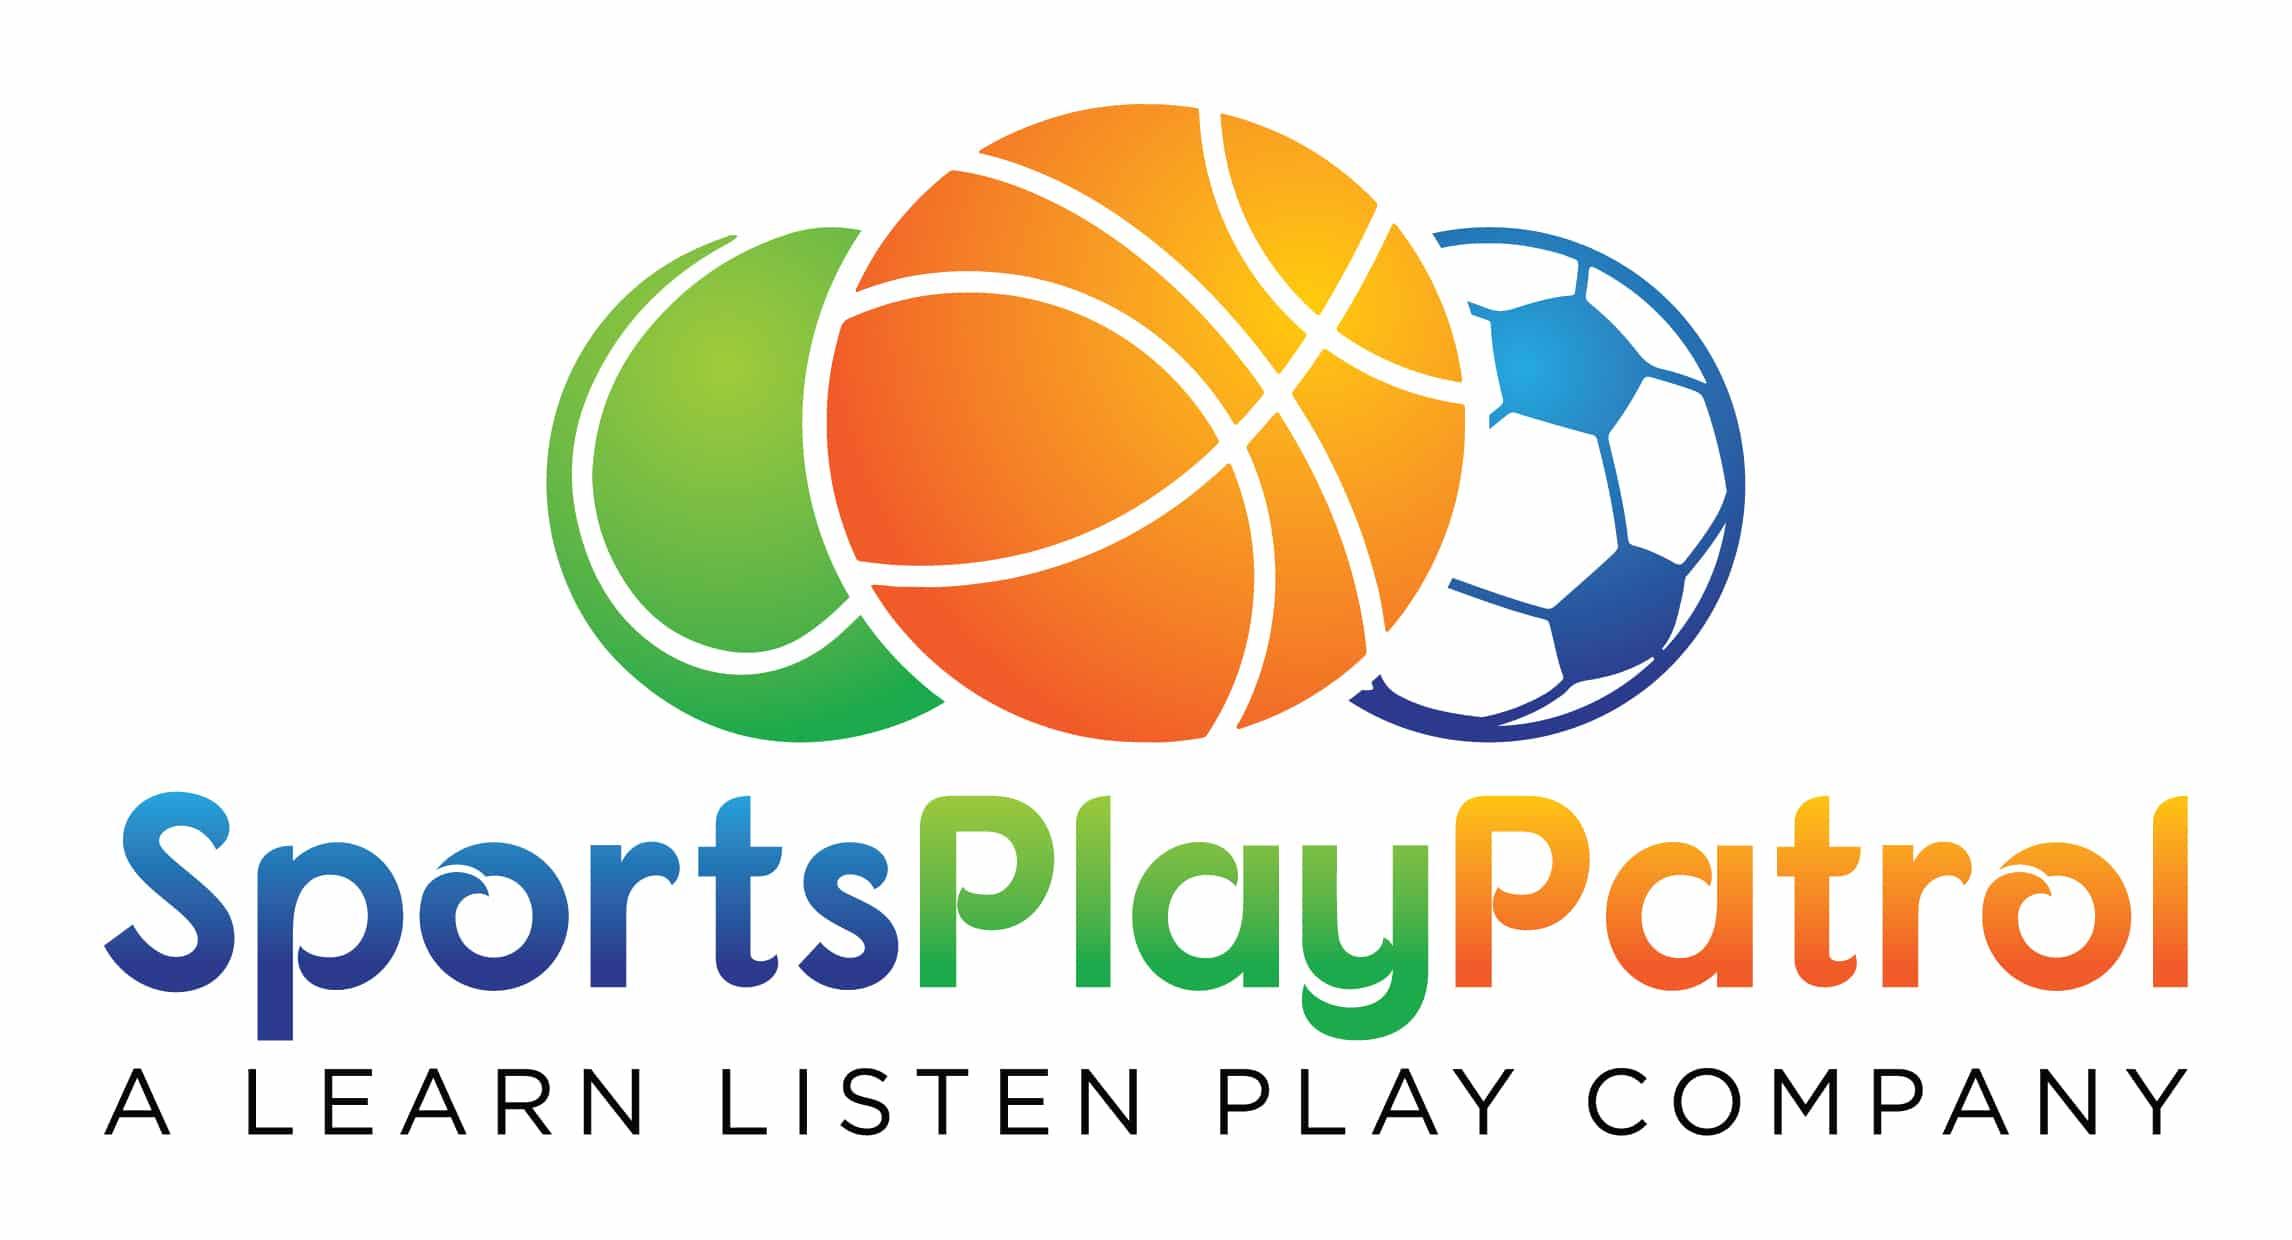 Sports Play Patrol